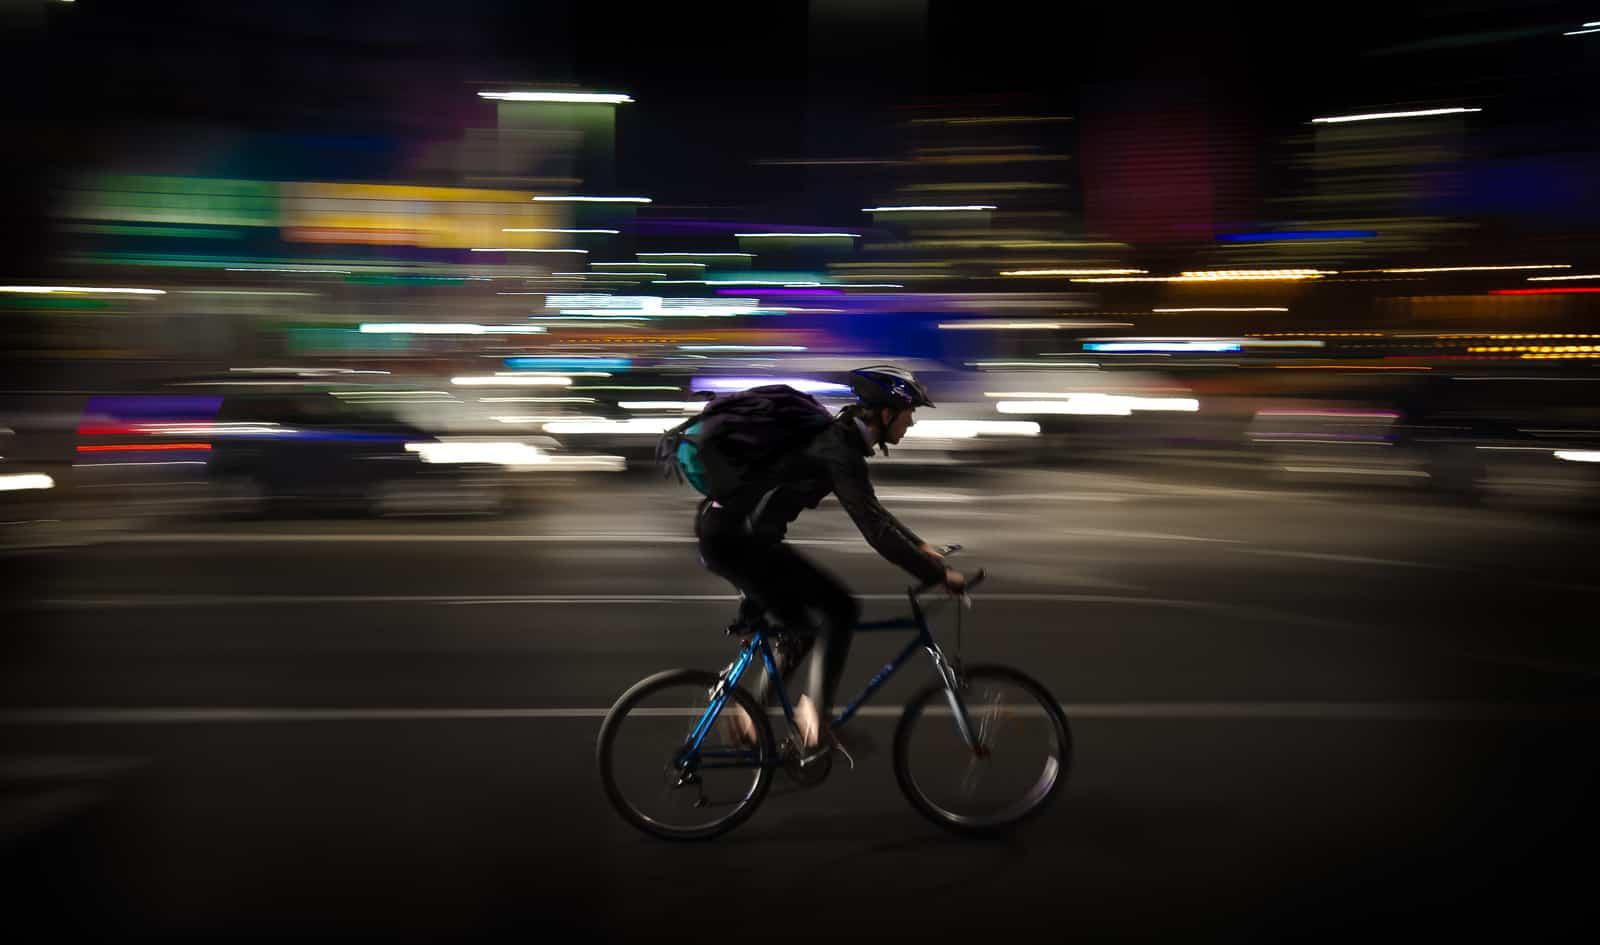 biker with mountain bike helmet lights at night